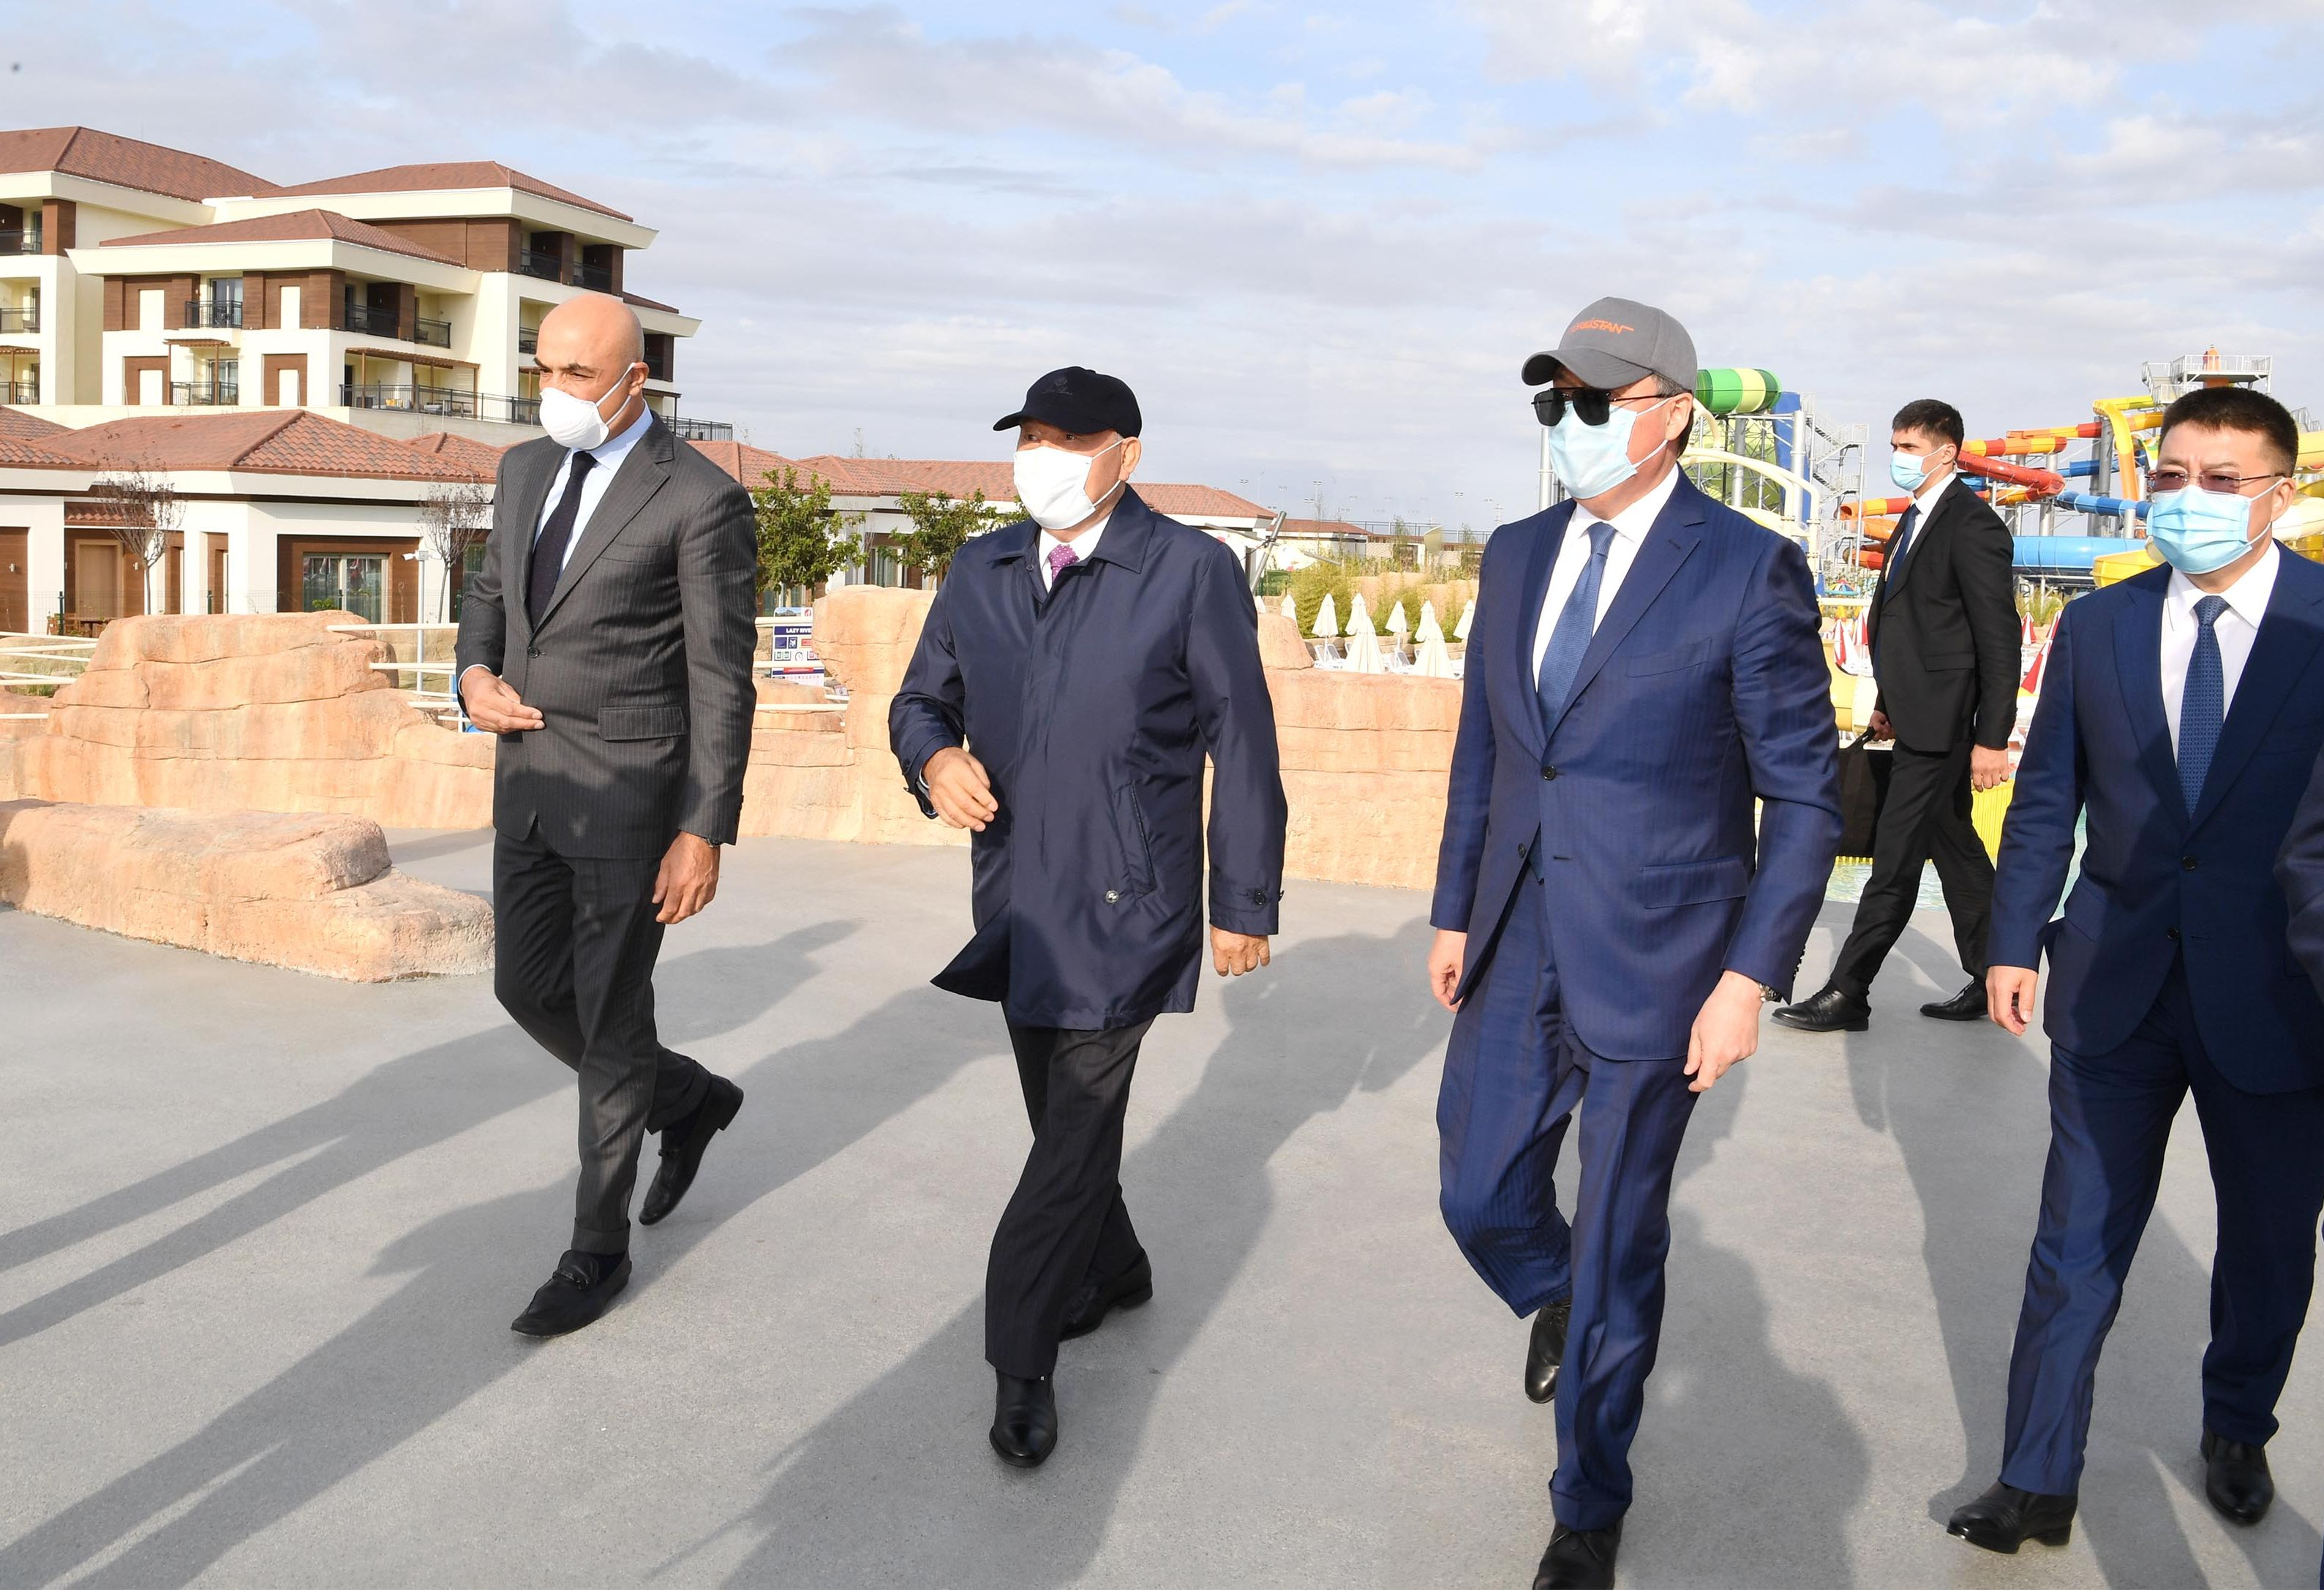 Нурсултану Назарбаеву презентовали международный туристический хаб  434691 - Kapital.kz